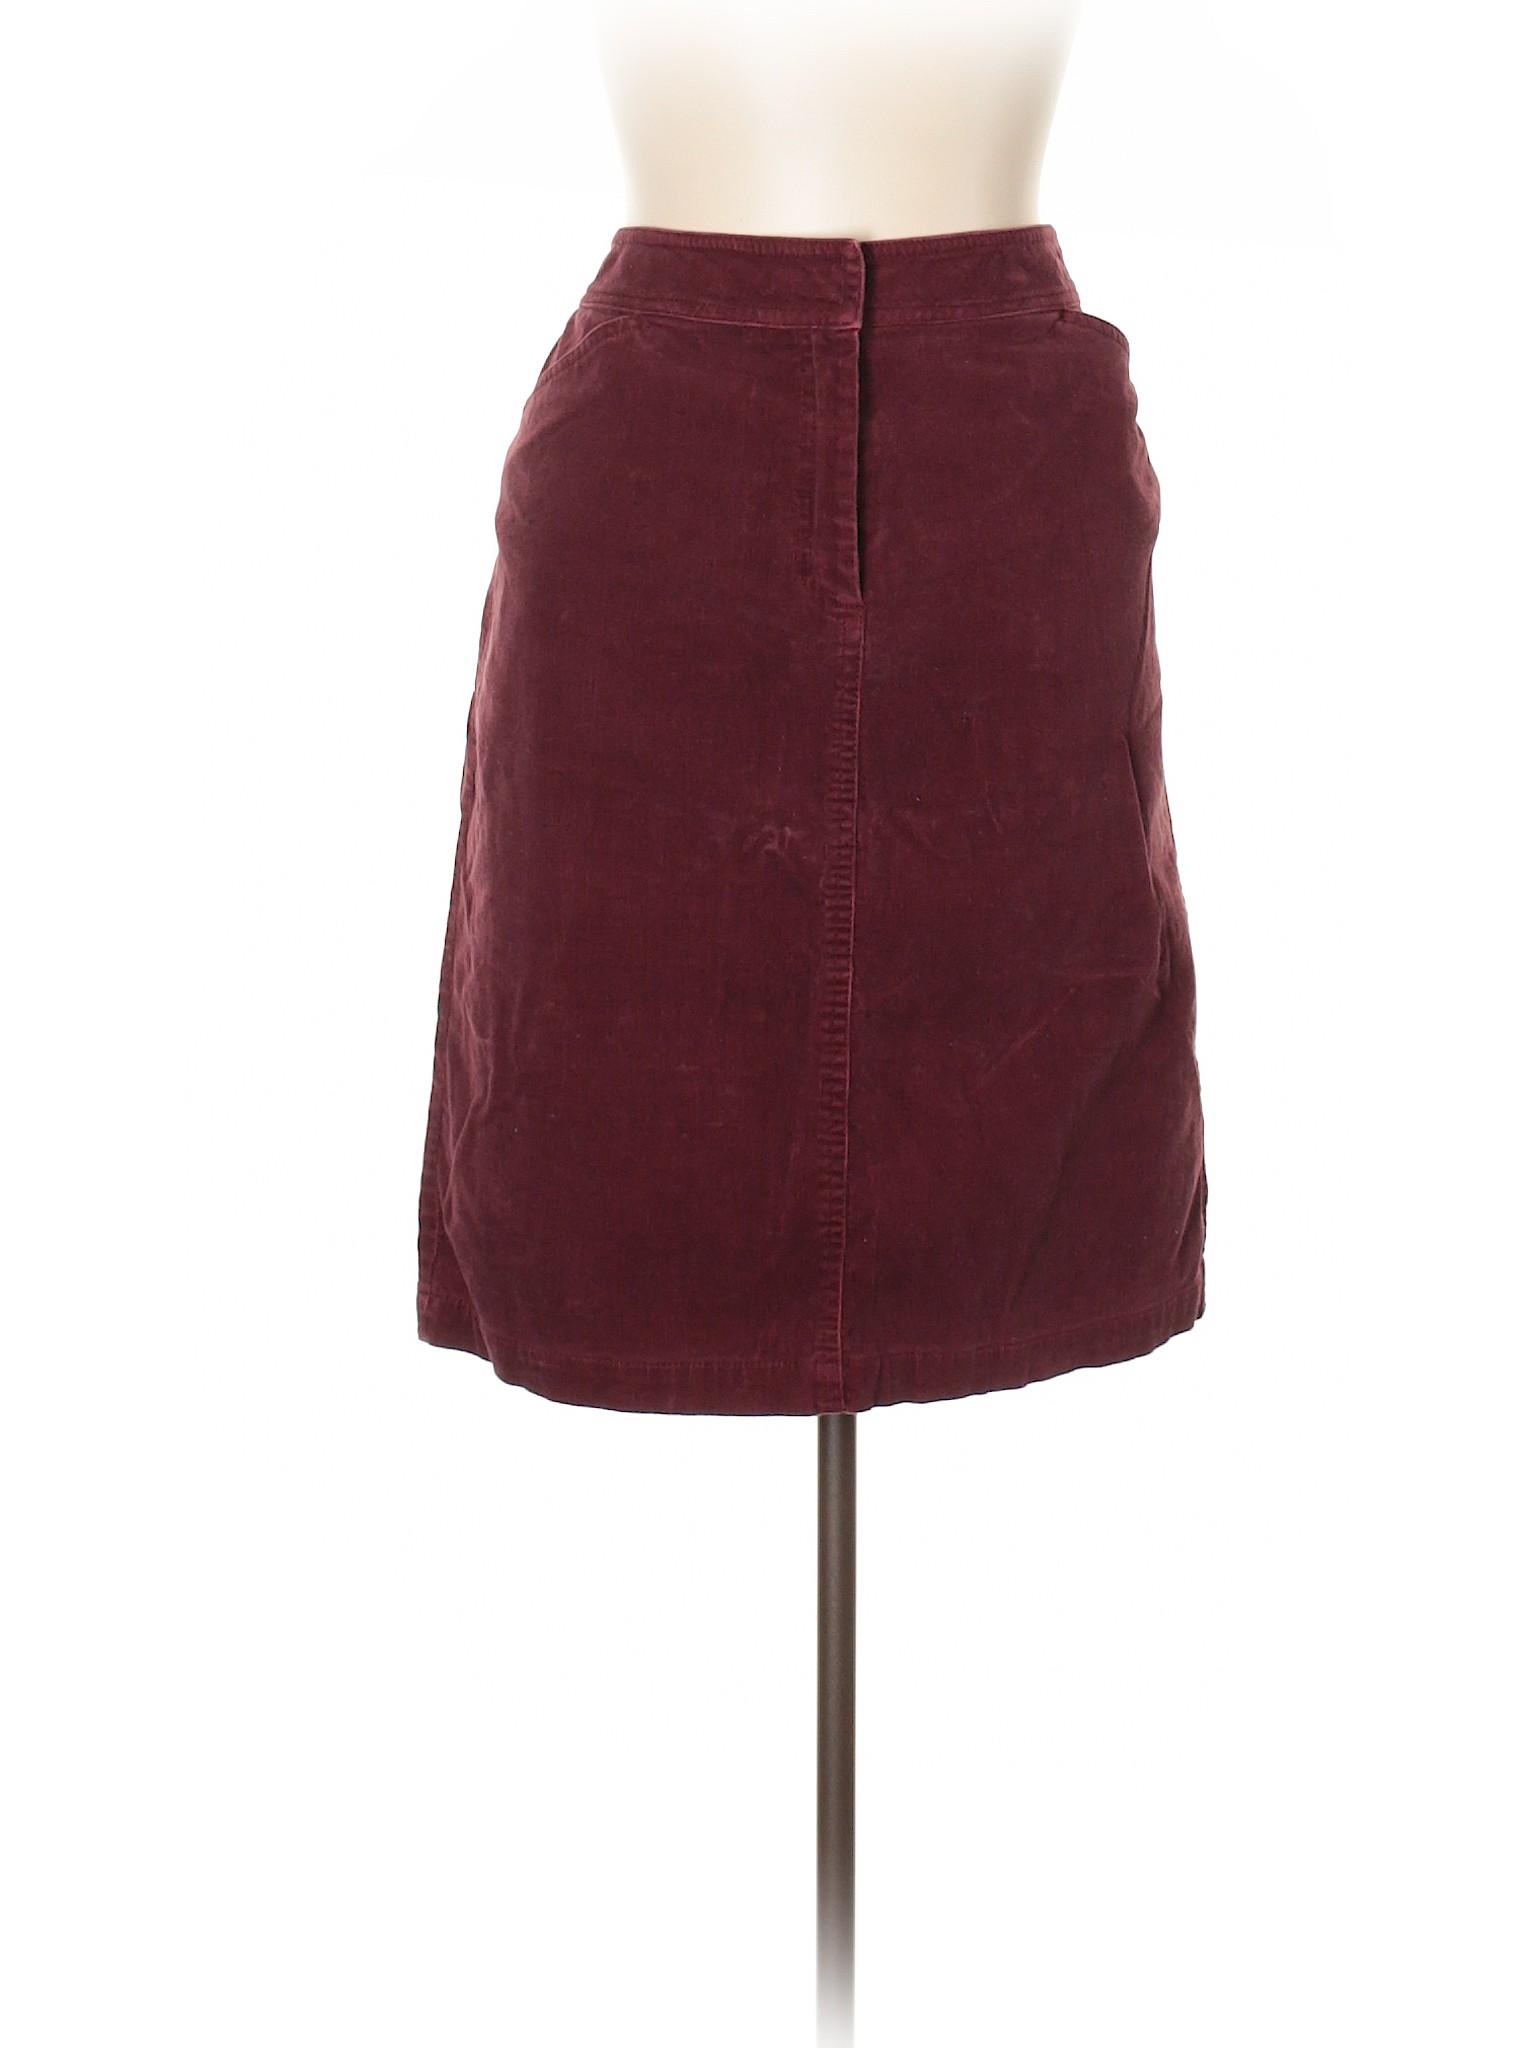 Boutique Boutique Casual Casual Boutique Boutique Skirt Skirt Casual Skirt Casual Skirt X0qww6